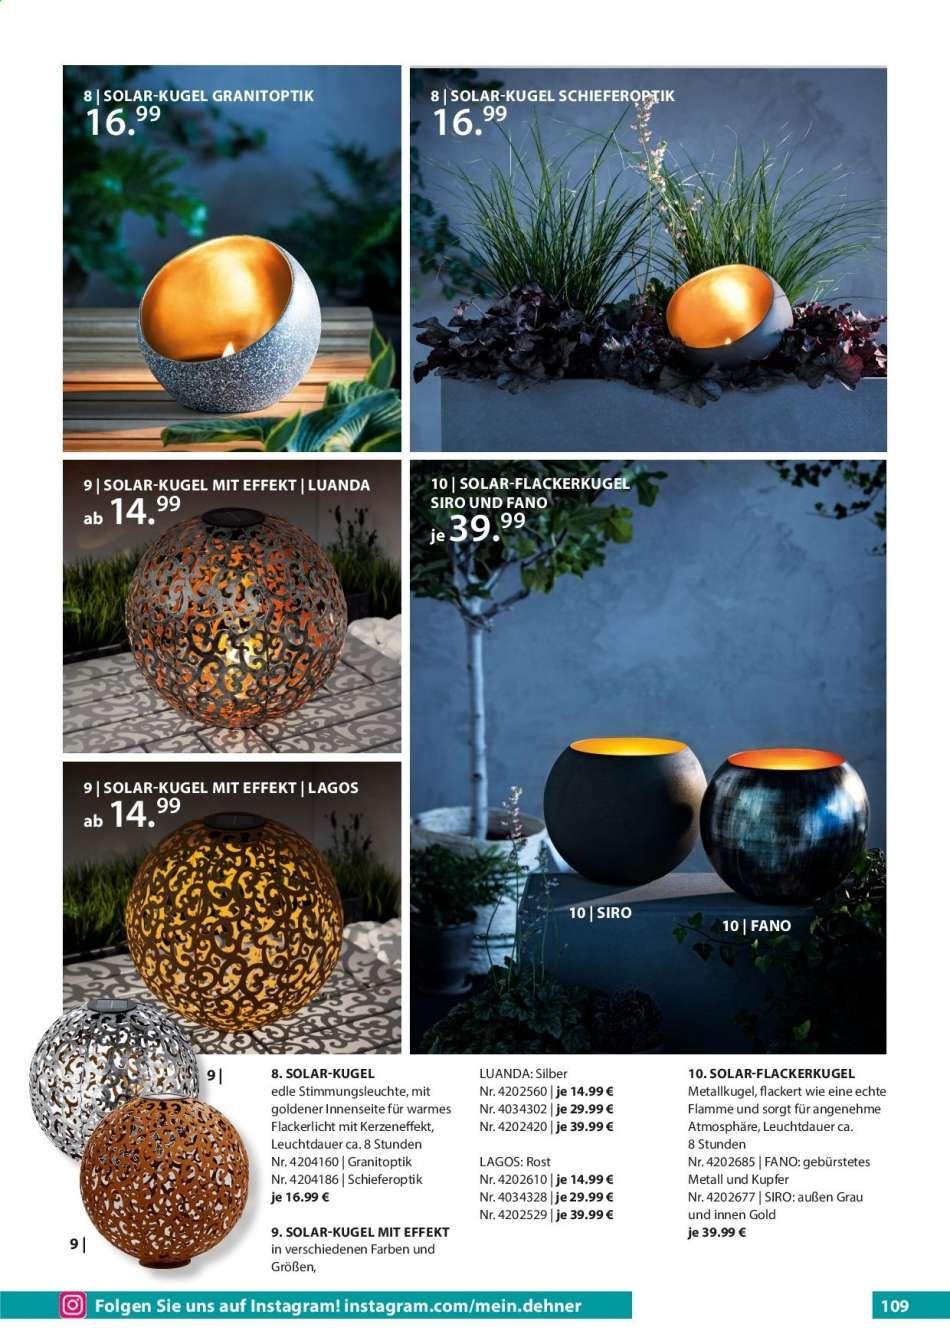 Full Size of Solarkugeln Aldi Dehner Aktuelle Prospekte Rabatt Kompass Relaxsessel Garten Wohnzimmer Solarkugeln Aldi